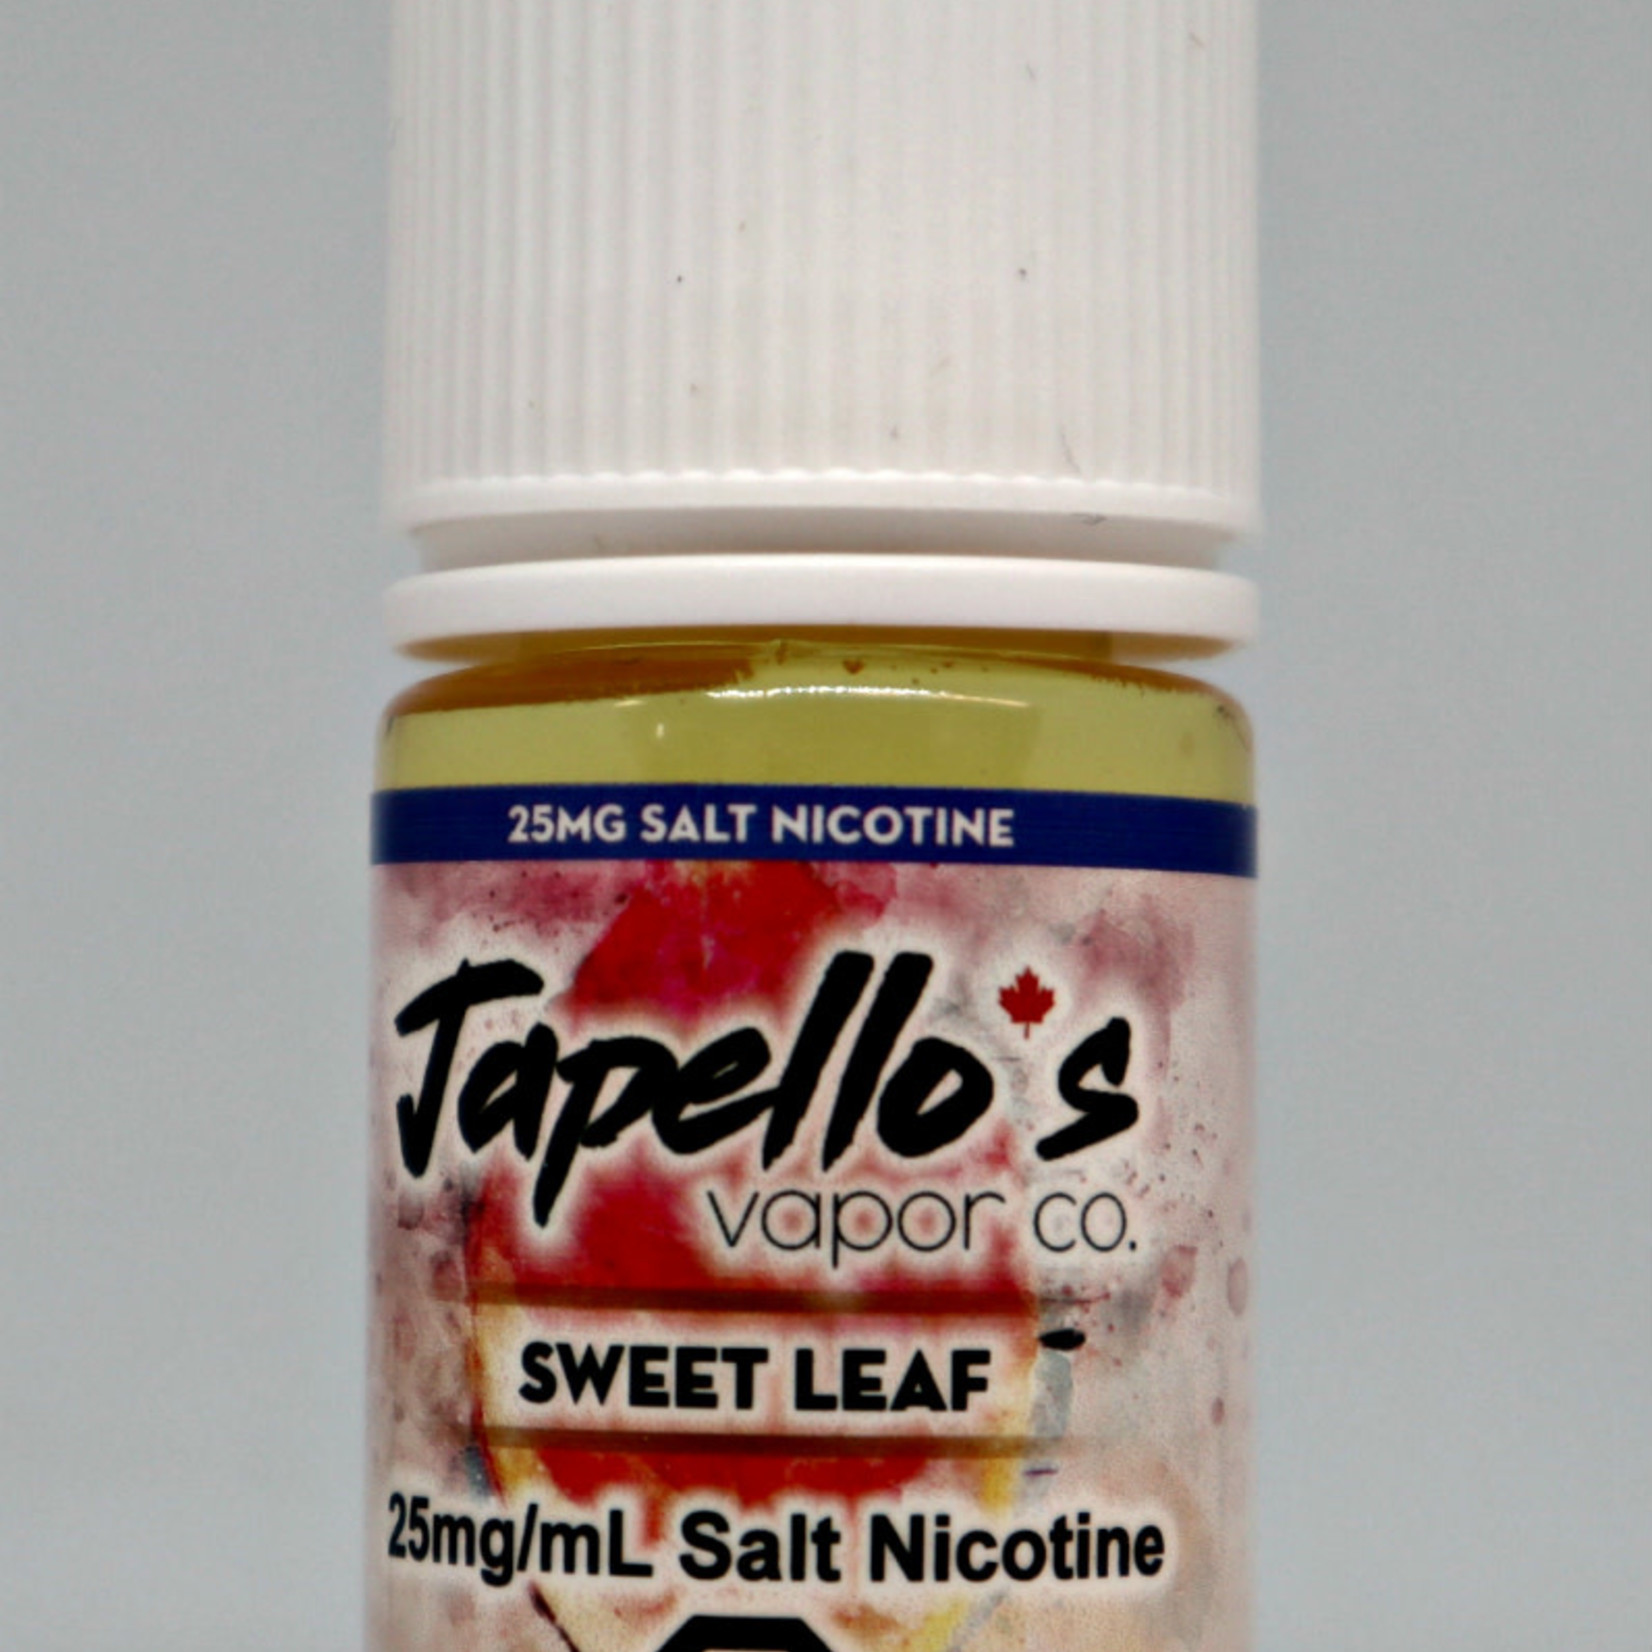 Japello's Tobacco Sweet Leaf Salt